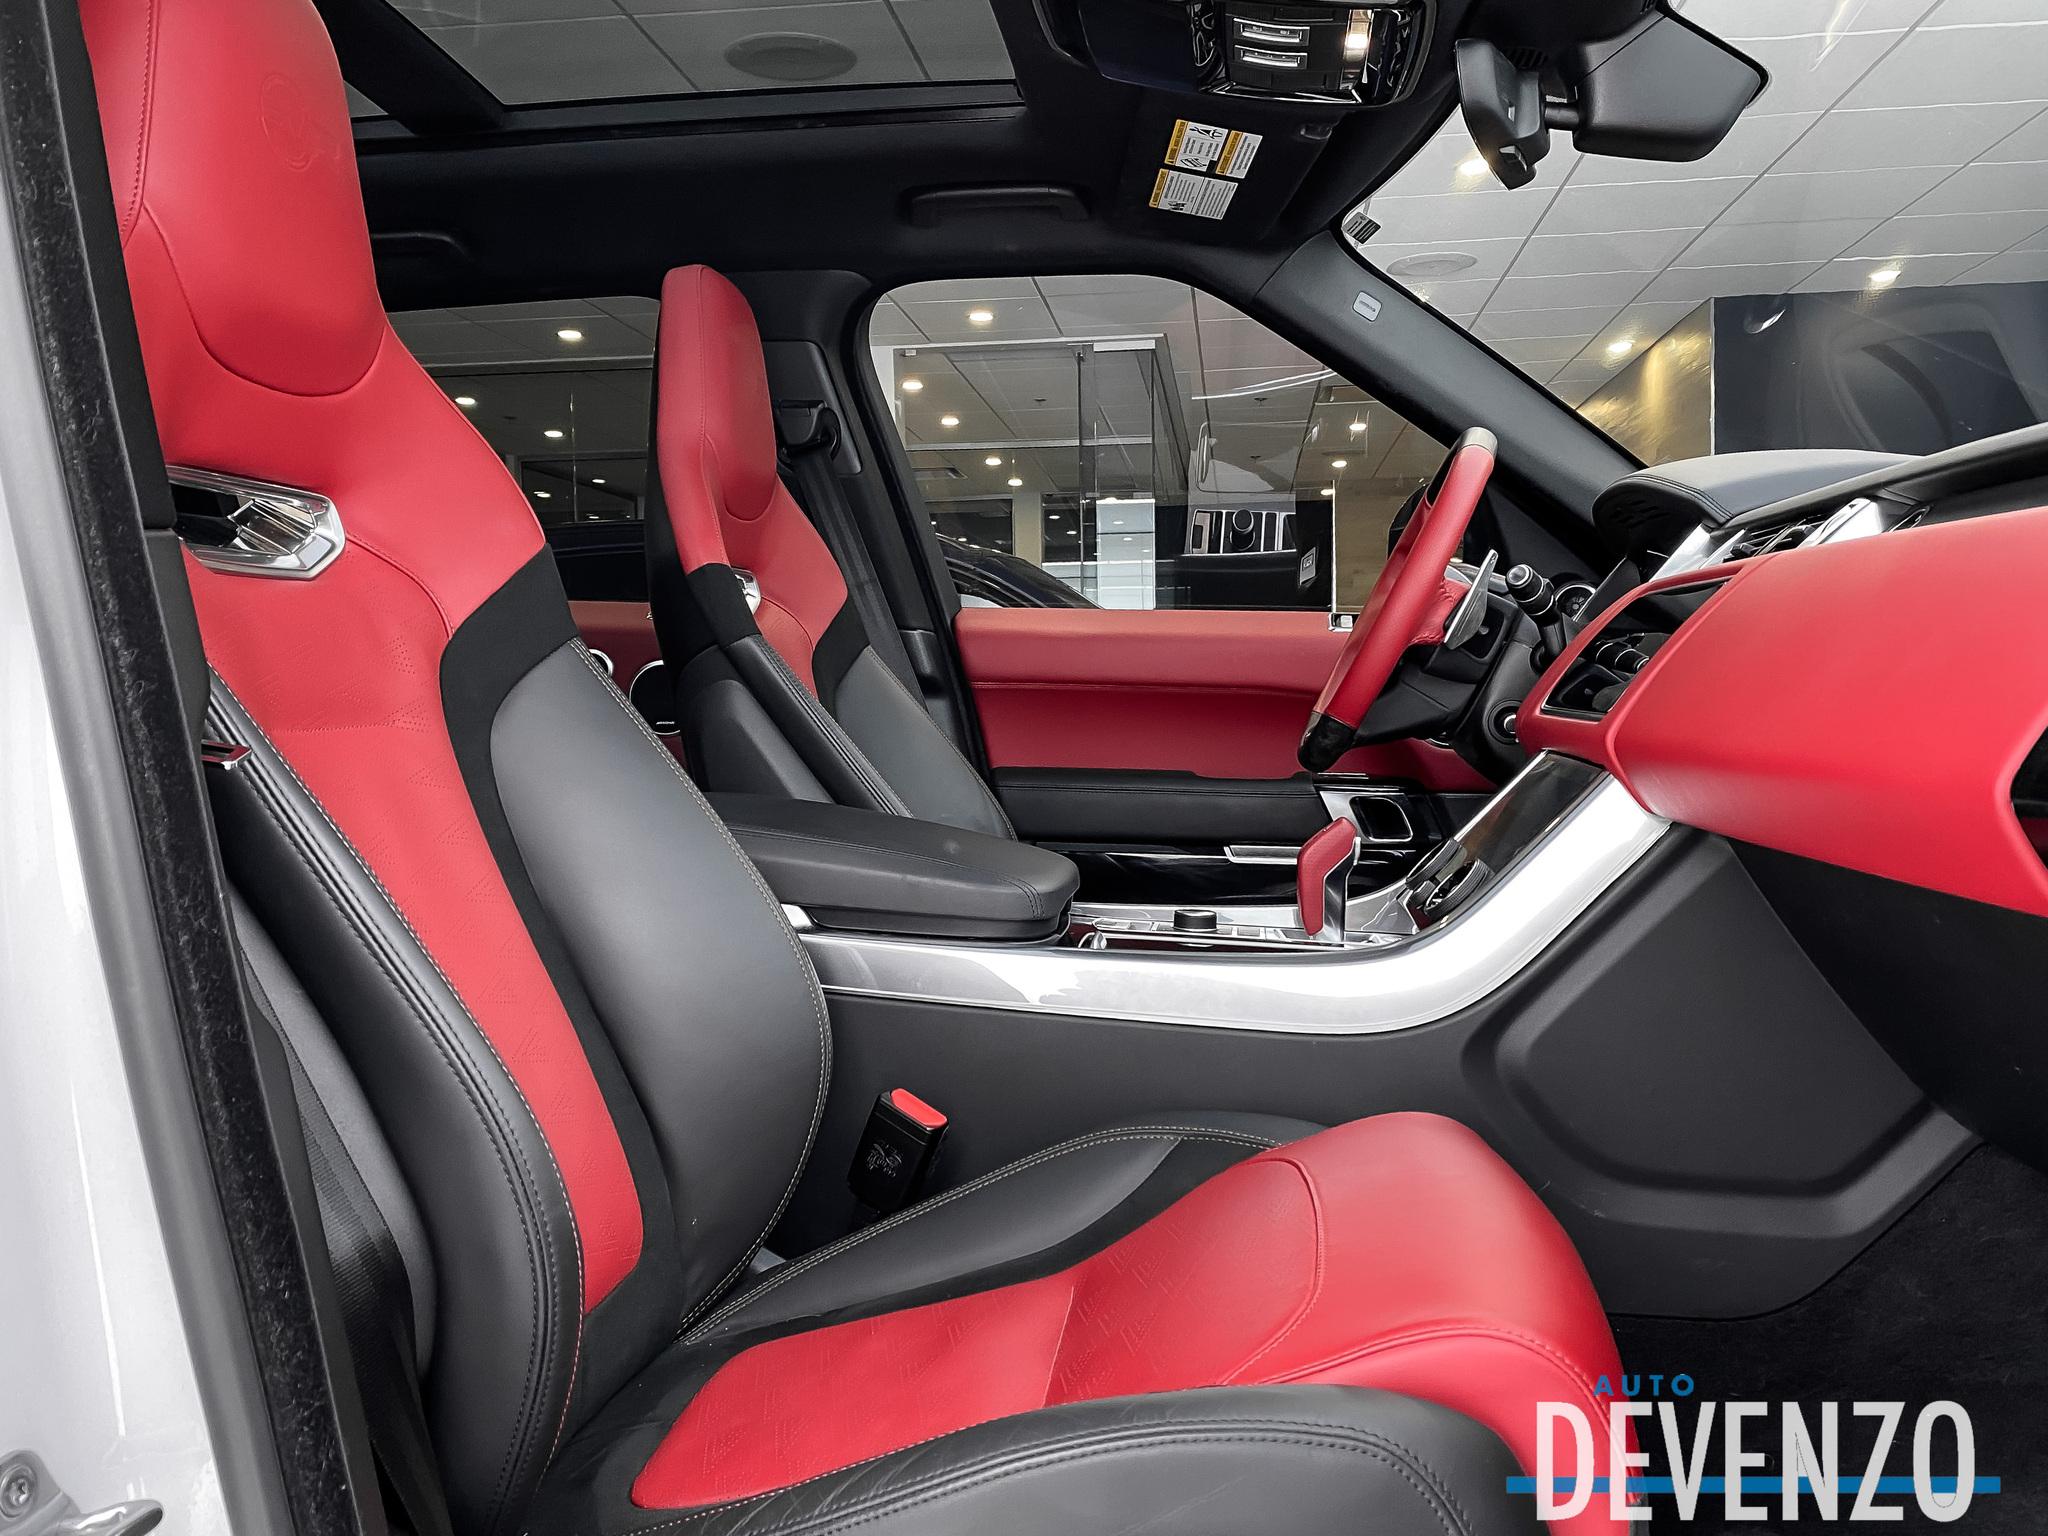 2019 Land Rover Range Rover Sport V8 Supercharged SVR 575HP Drive Pro Pack complet